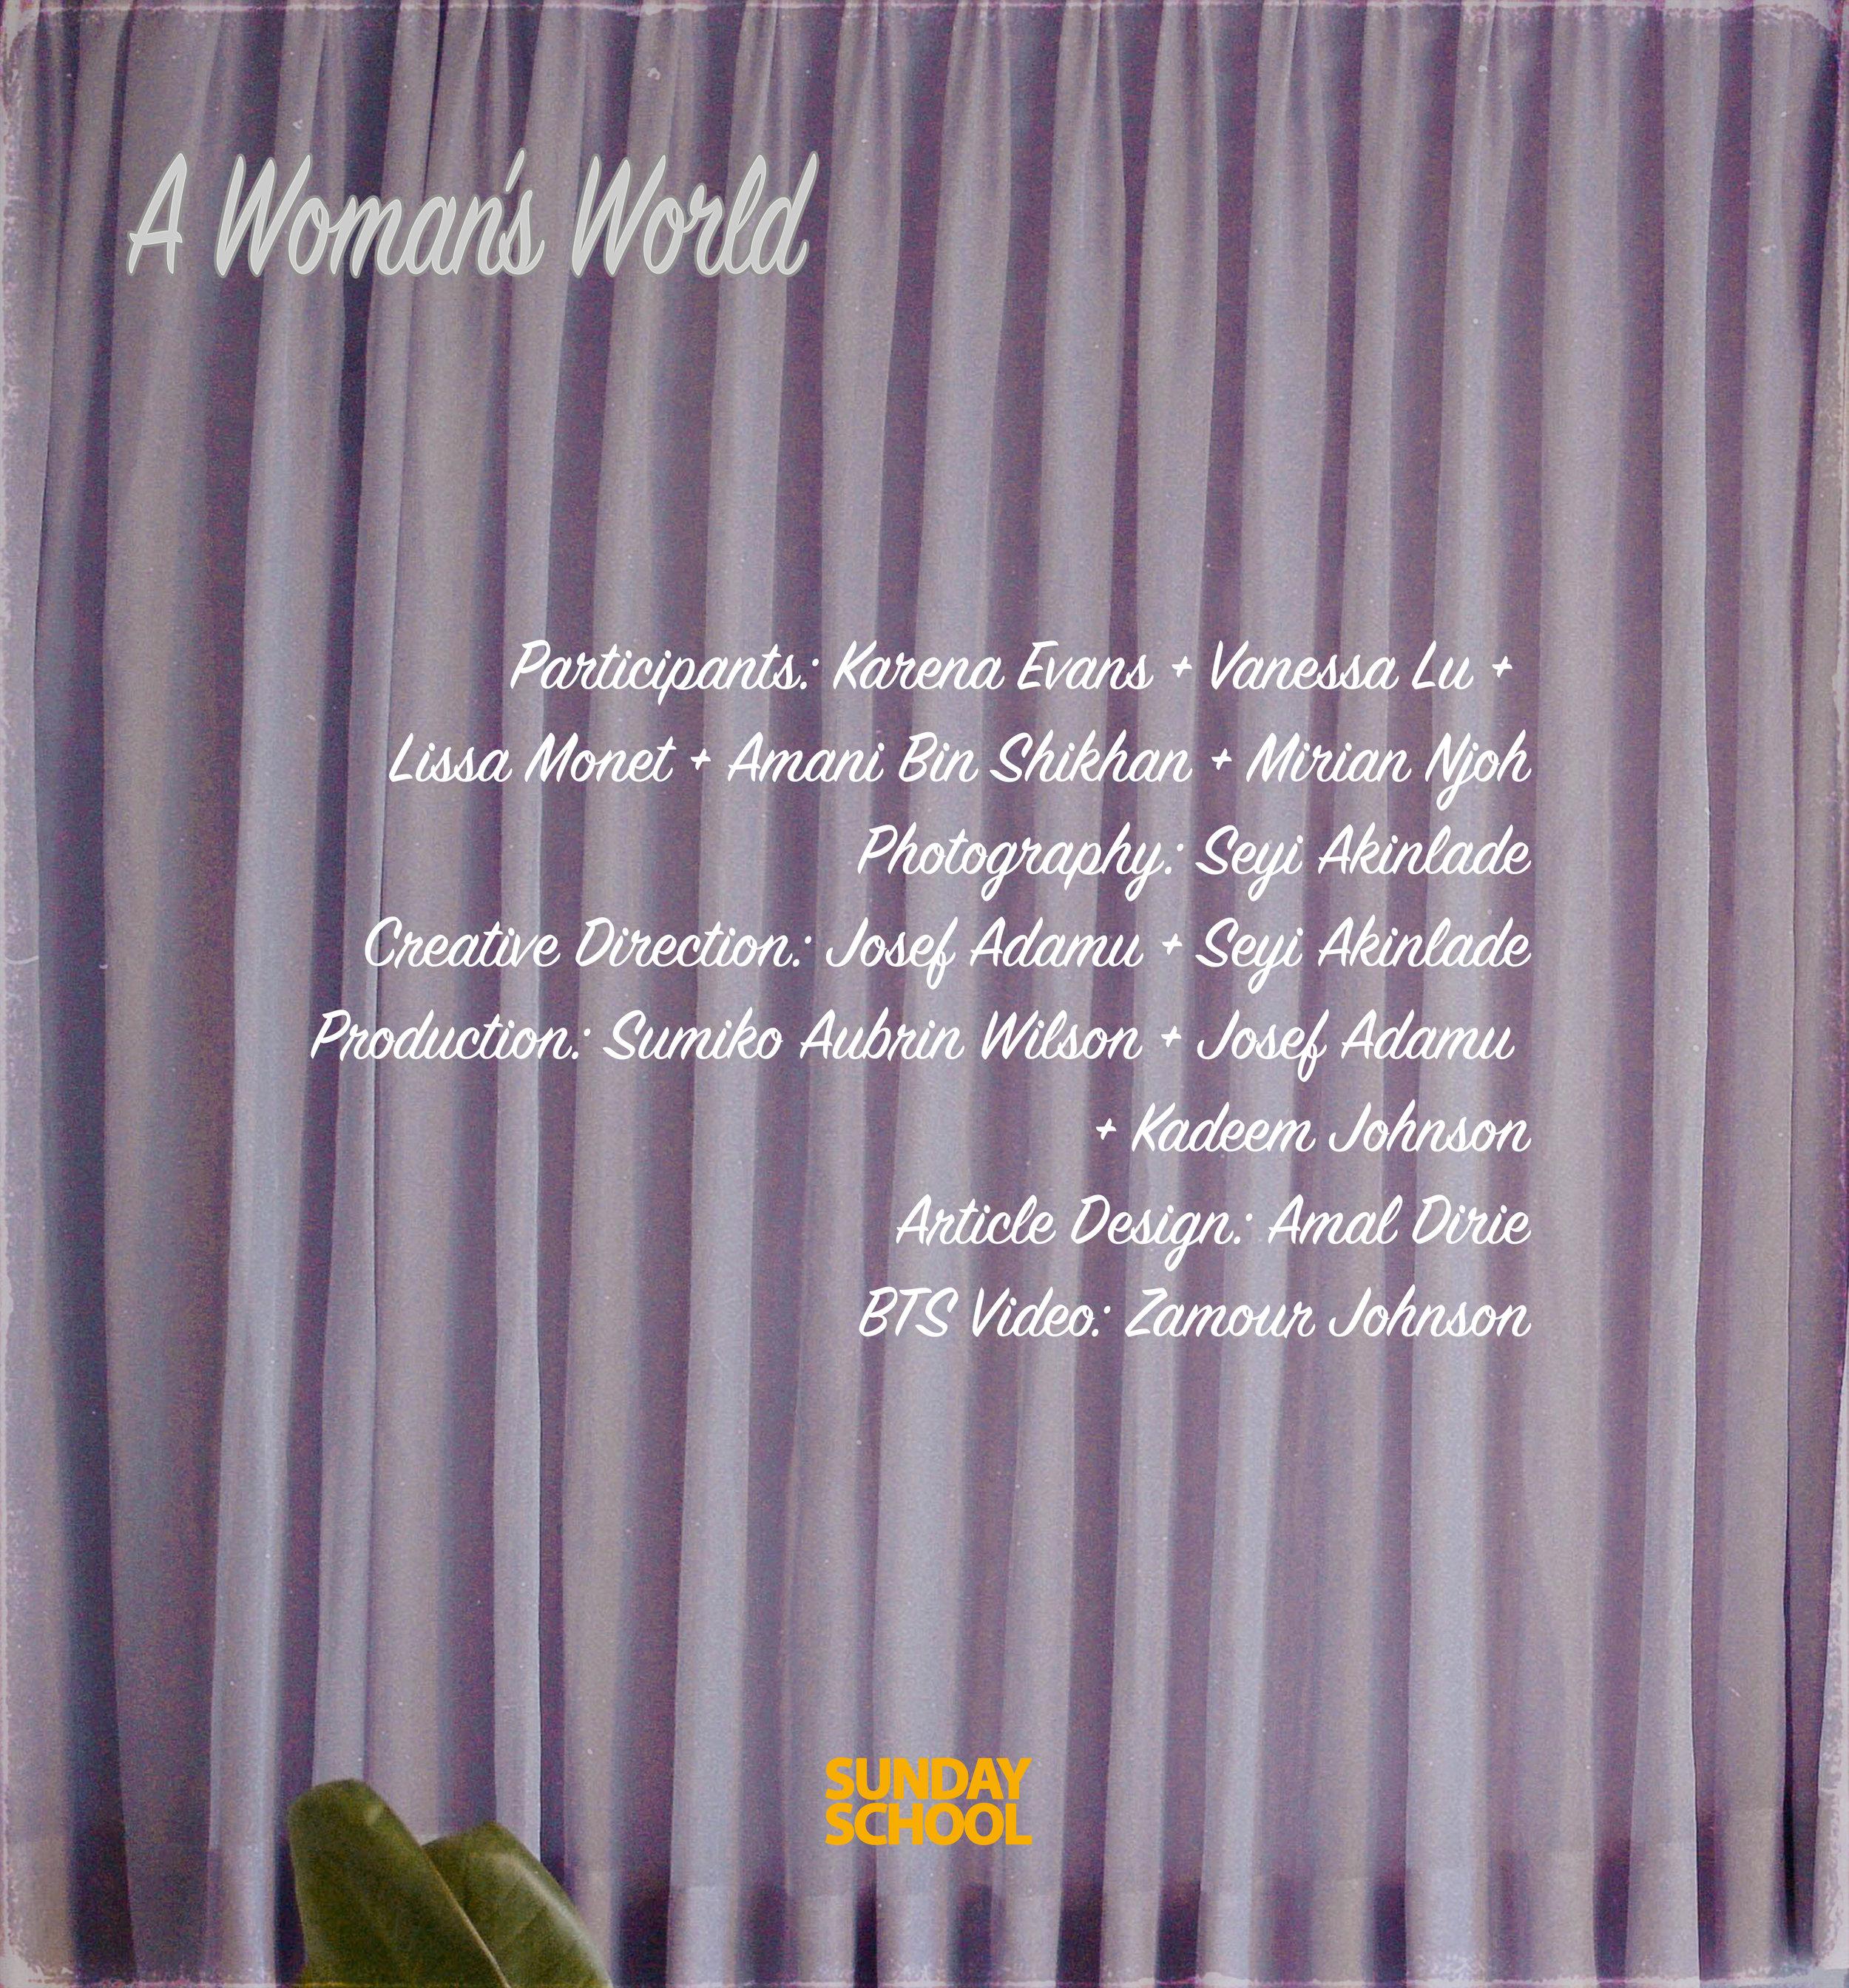 womansworldbackcover.jpg